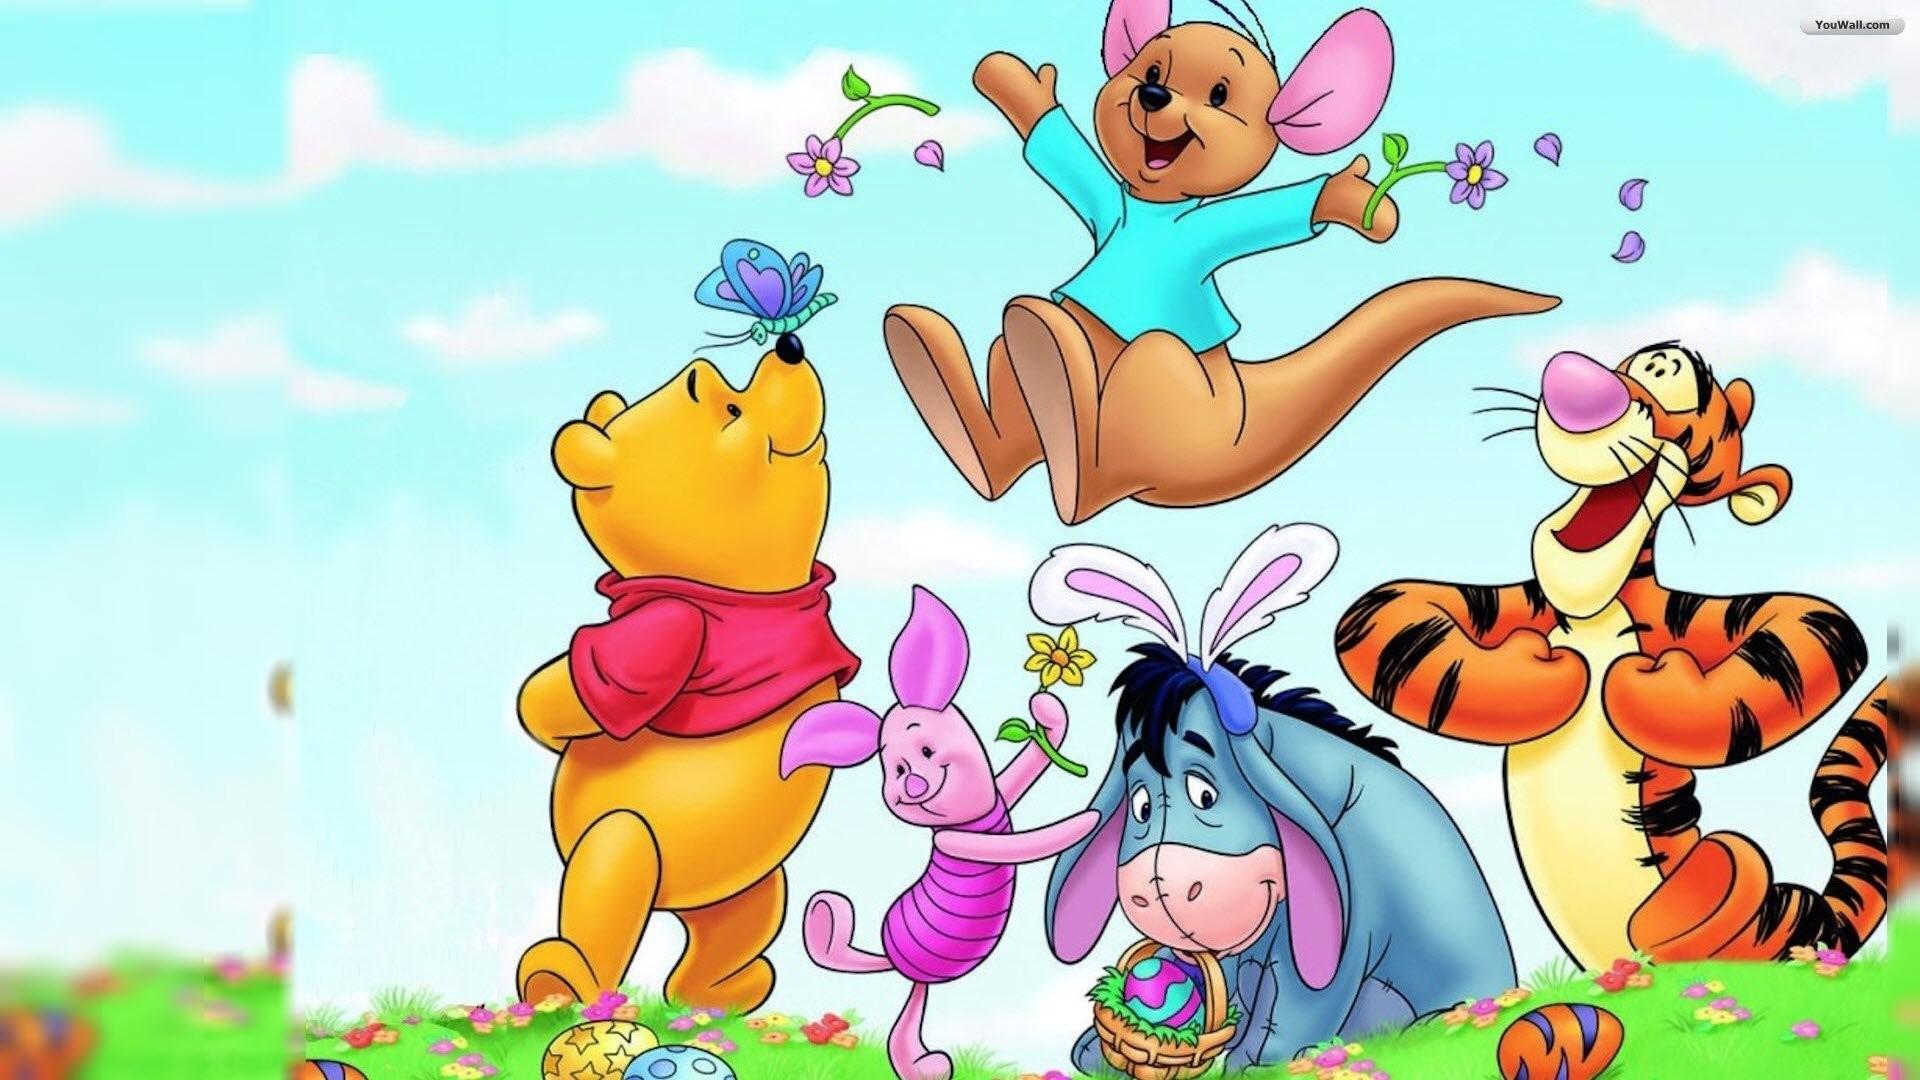 Winnie the pooh and friends wallpaper desktop